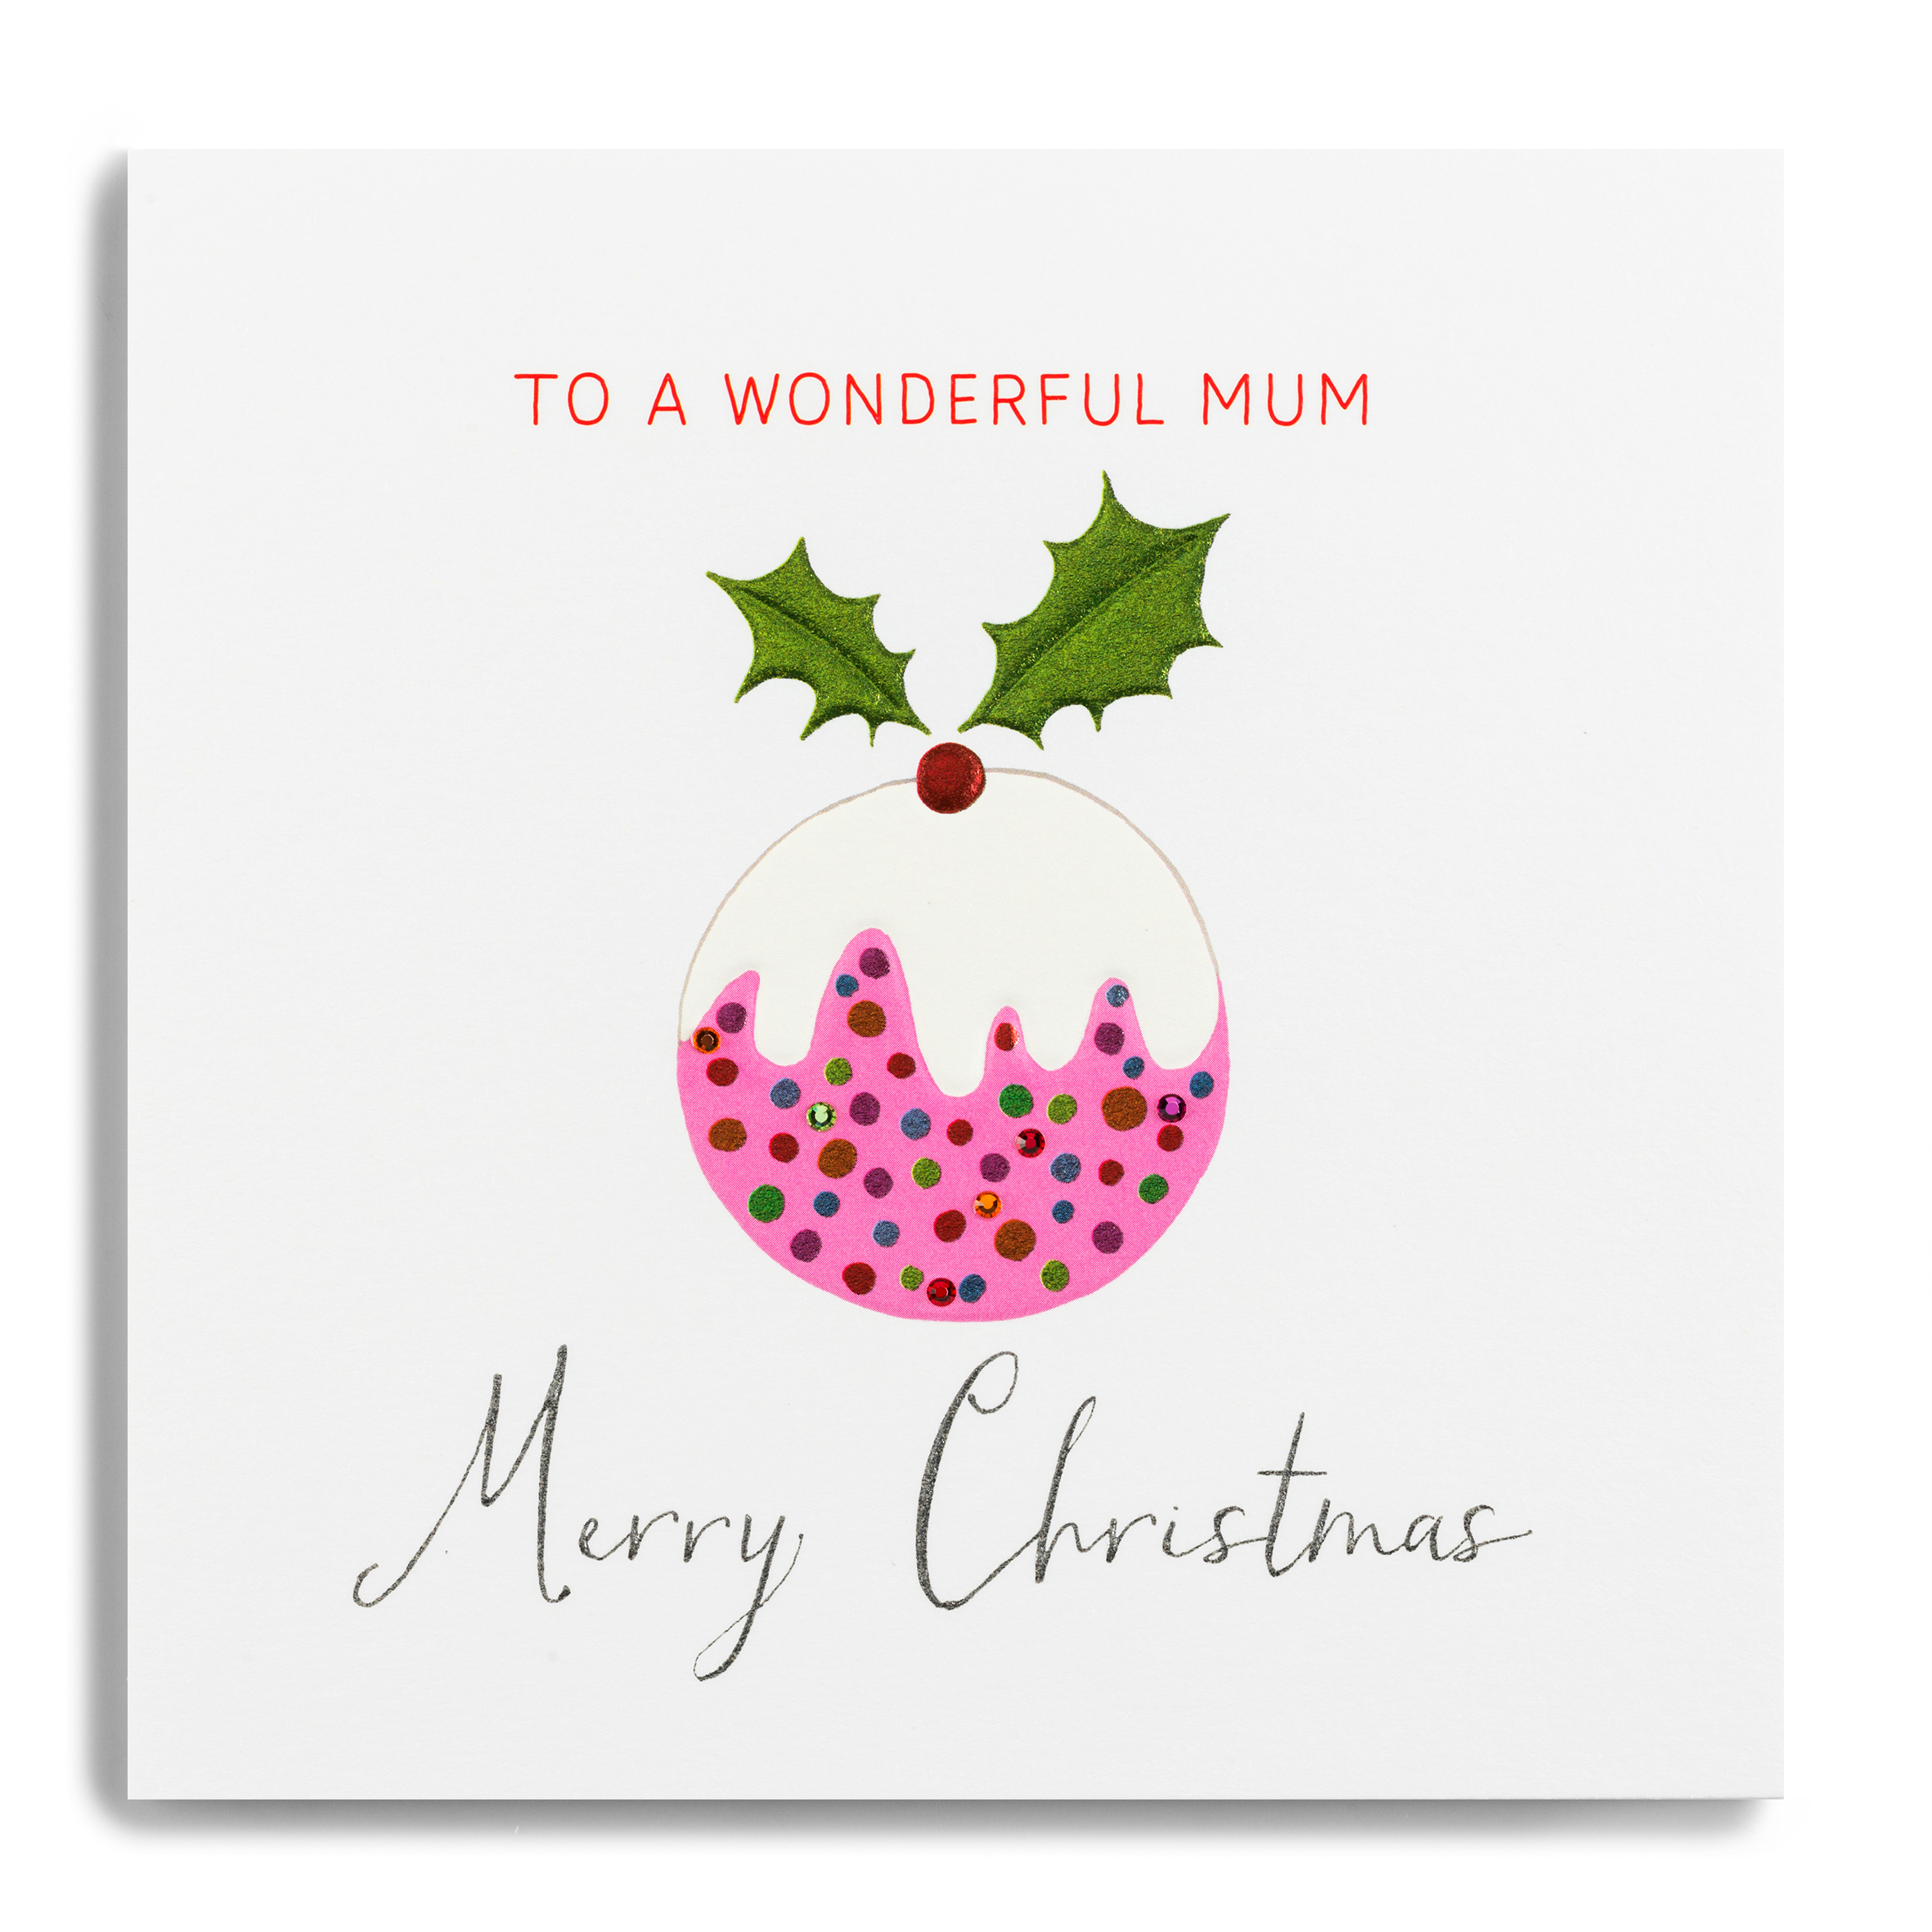 Forget Me Not Merry Christmas Wonderful Mum